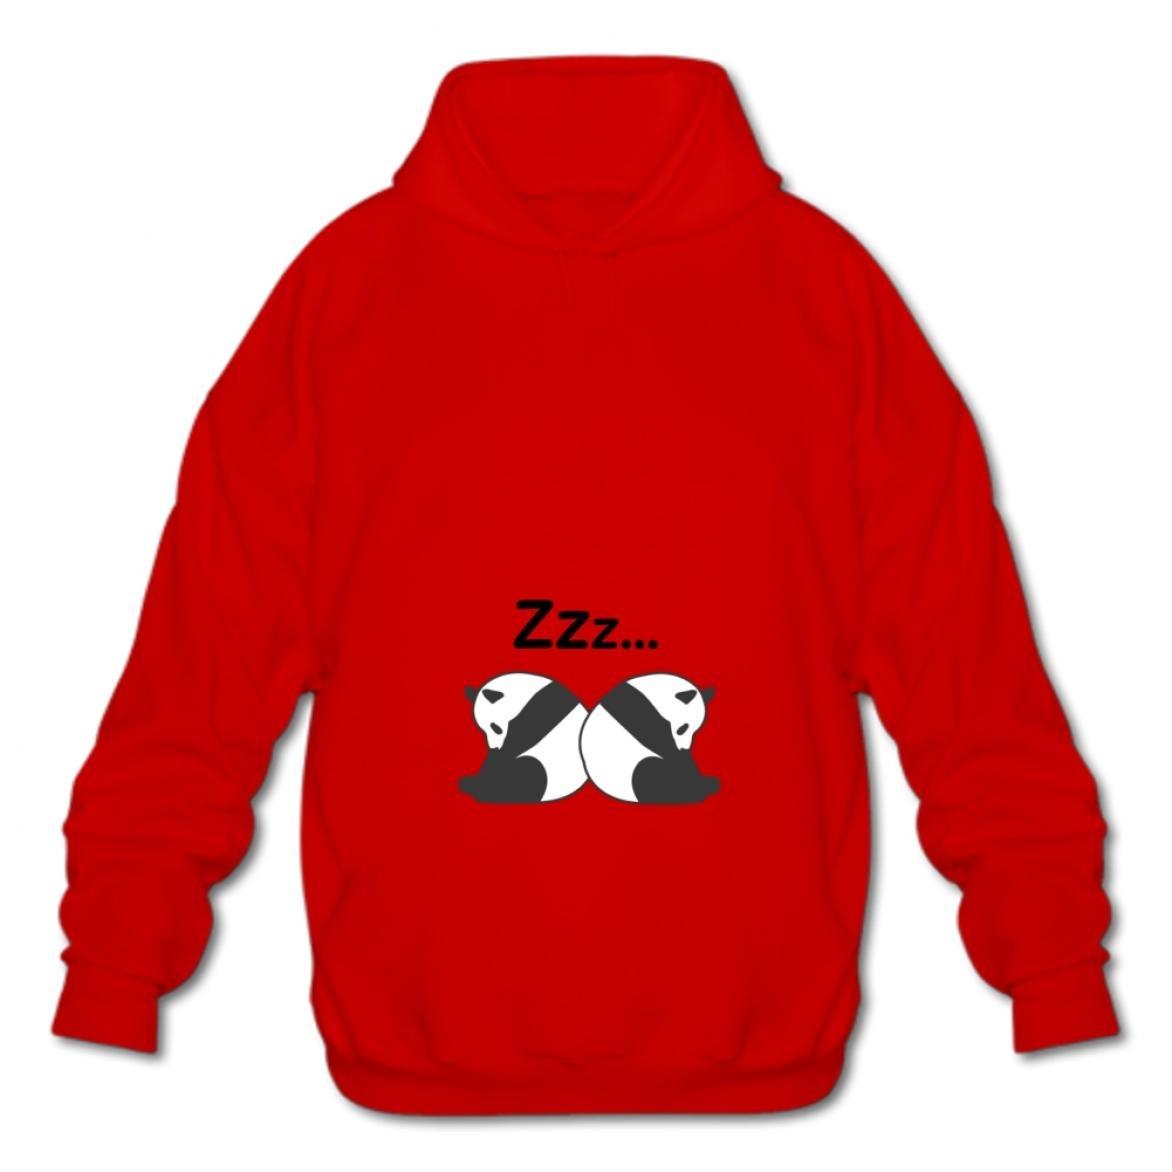 Gizhongqu Sweatshirt Hooded Fashion Hoodies-03 Cartoon Panda Kusa Cotton Pullover Fashion Mens